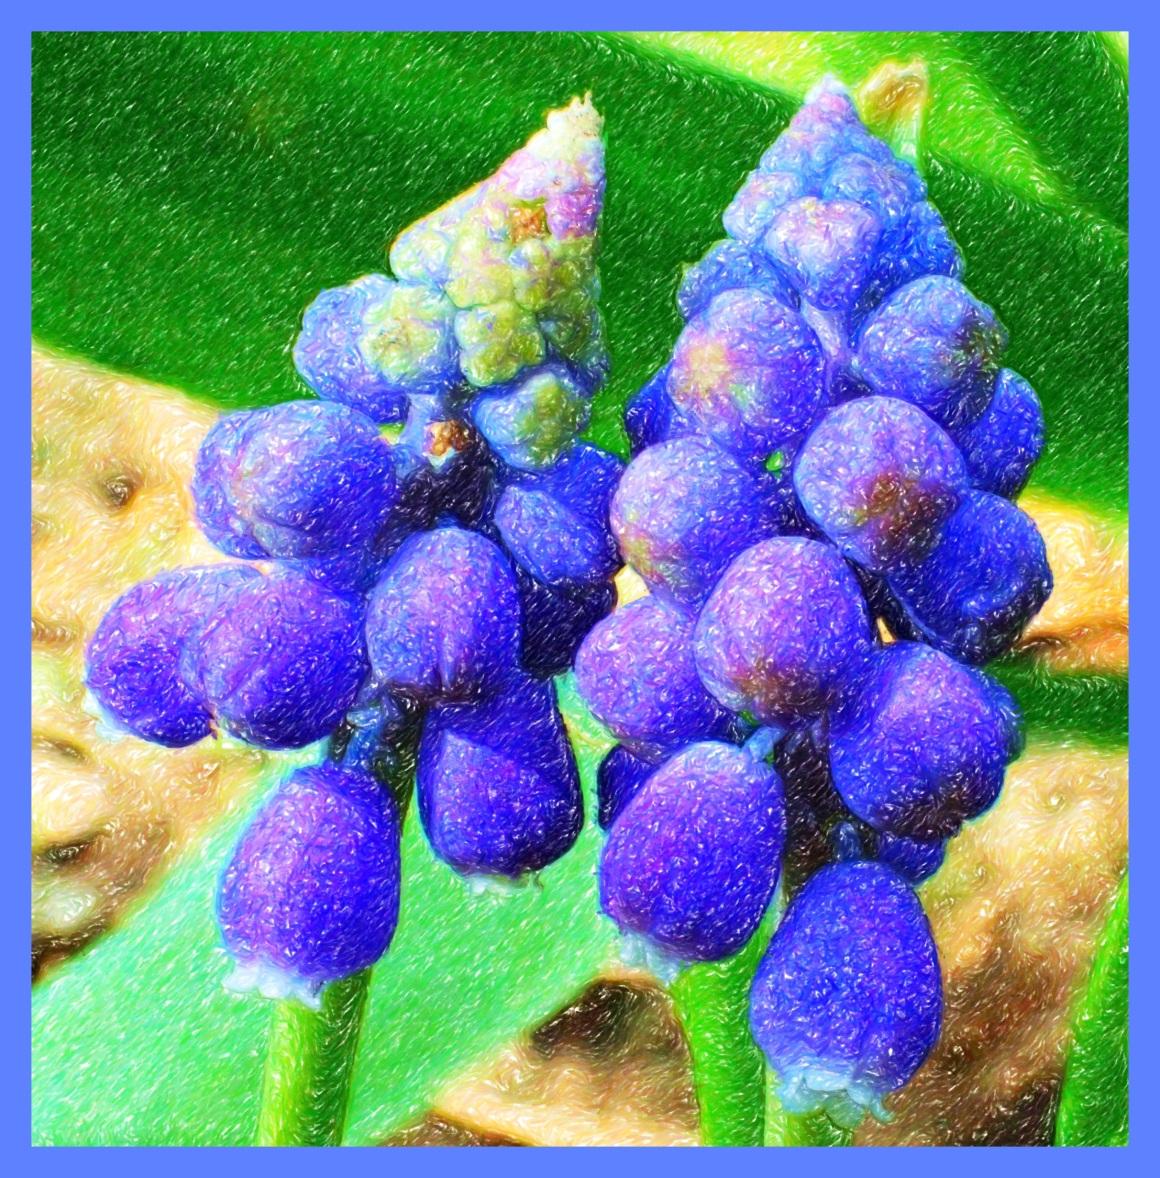 Grape Hyacinths (2) (Color Pencil, Digital) Photo by Thomas Peace c. 2015